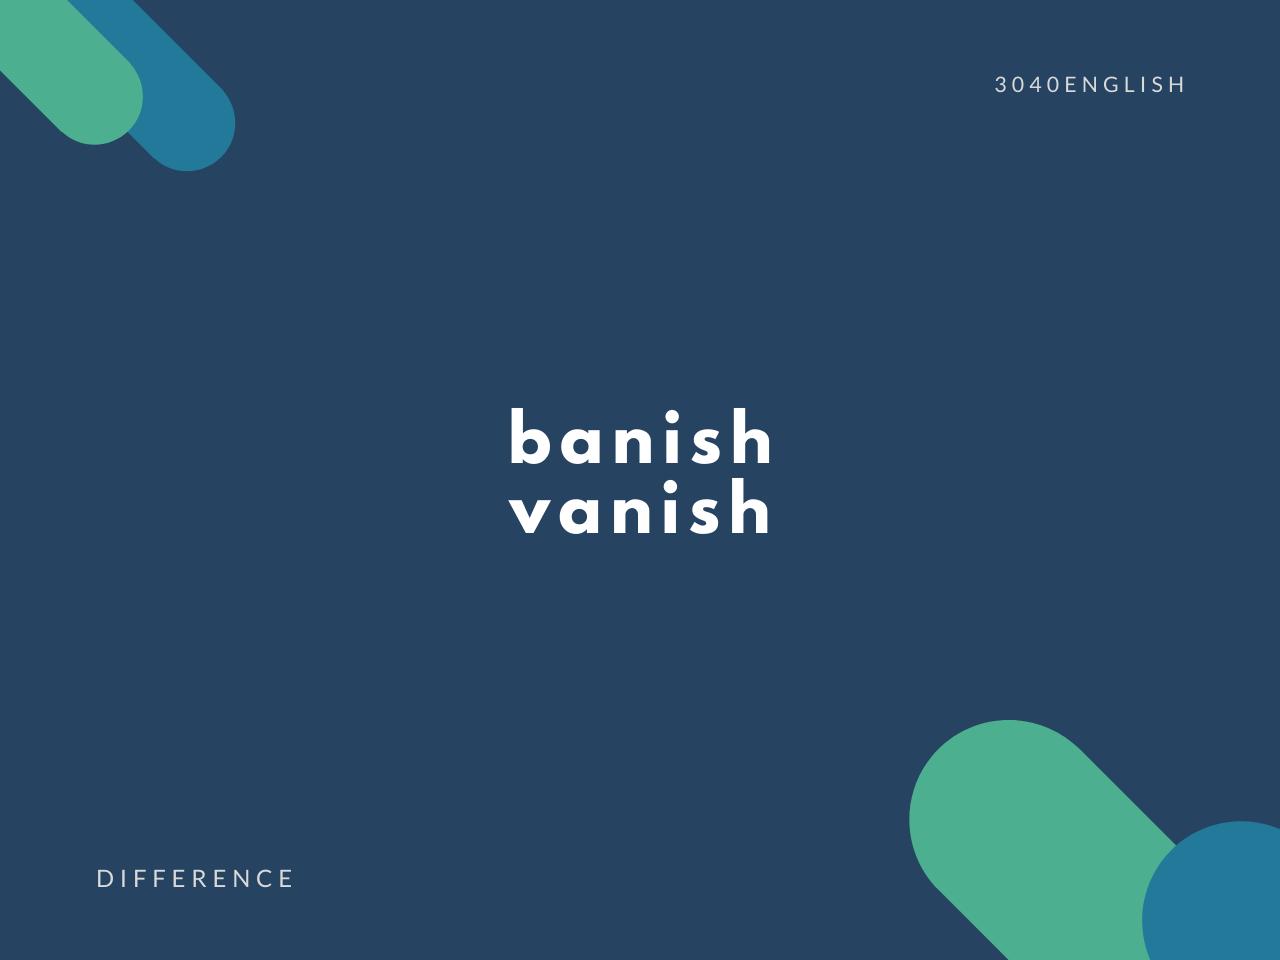 banish, vanish の違いとは?【意味・例文あり】【バニシュ】